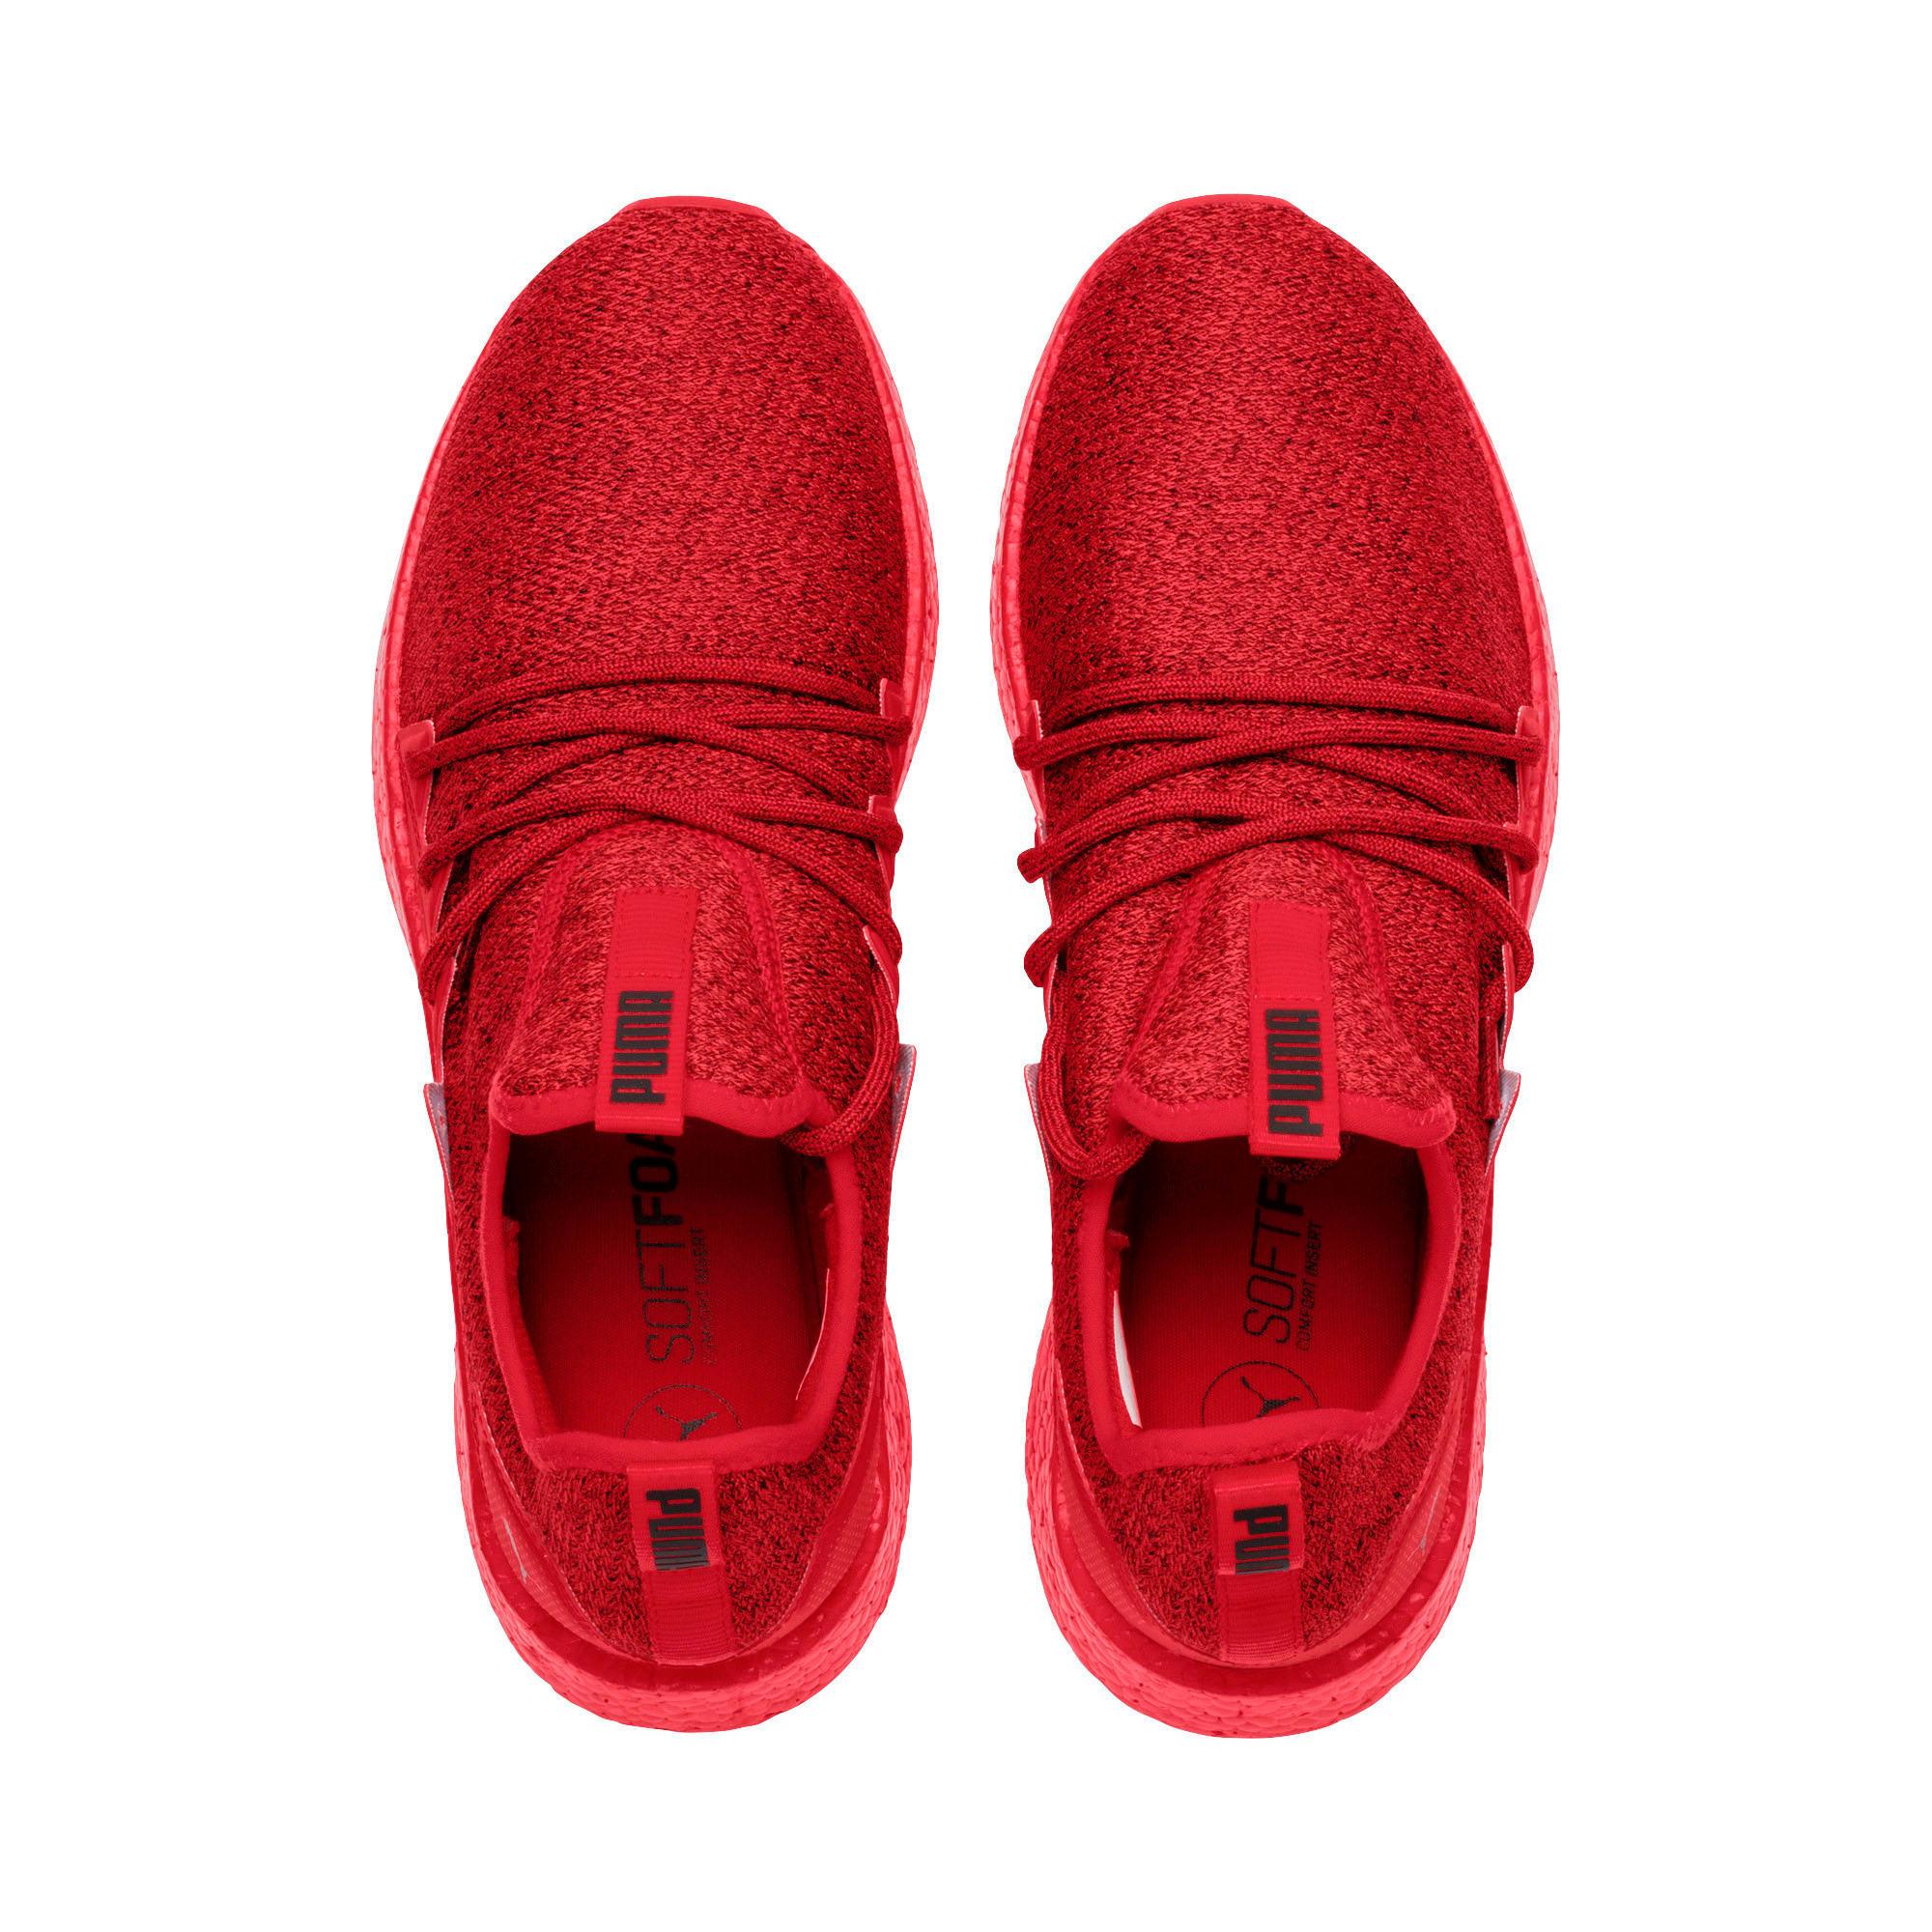 Thumbnail 6 of NRGY Neko Knit Men's Running Shoes, High Risk Red-Puma Black, medium